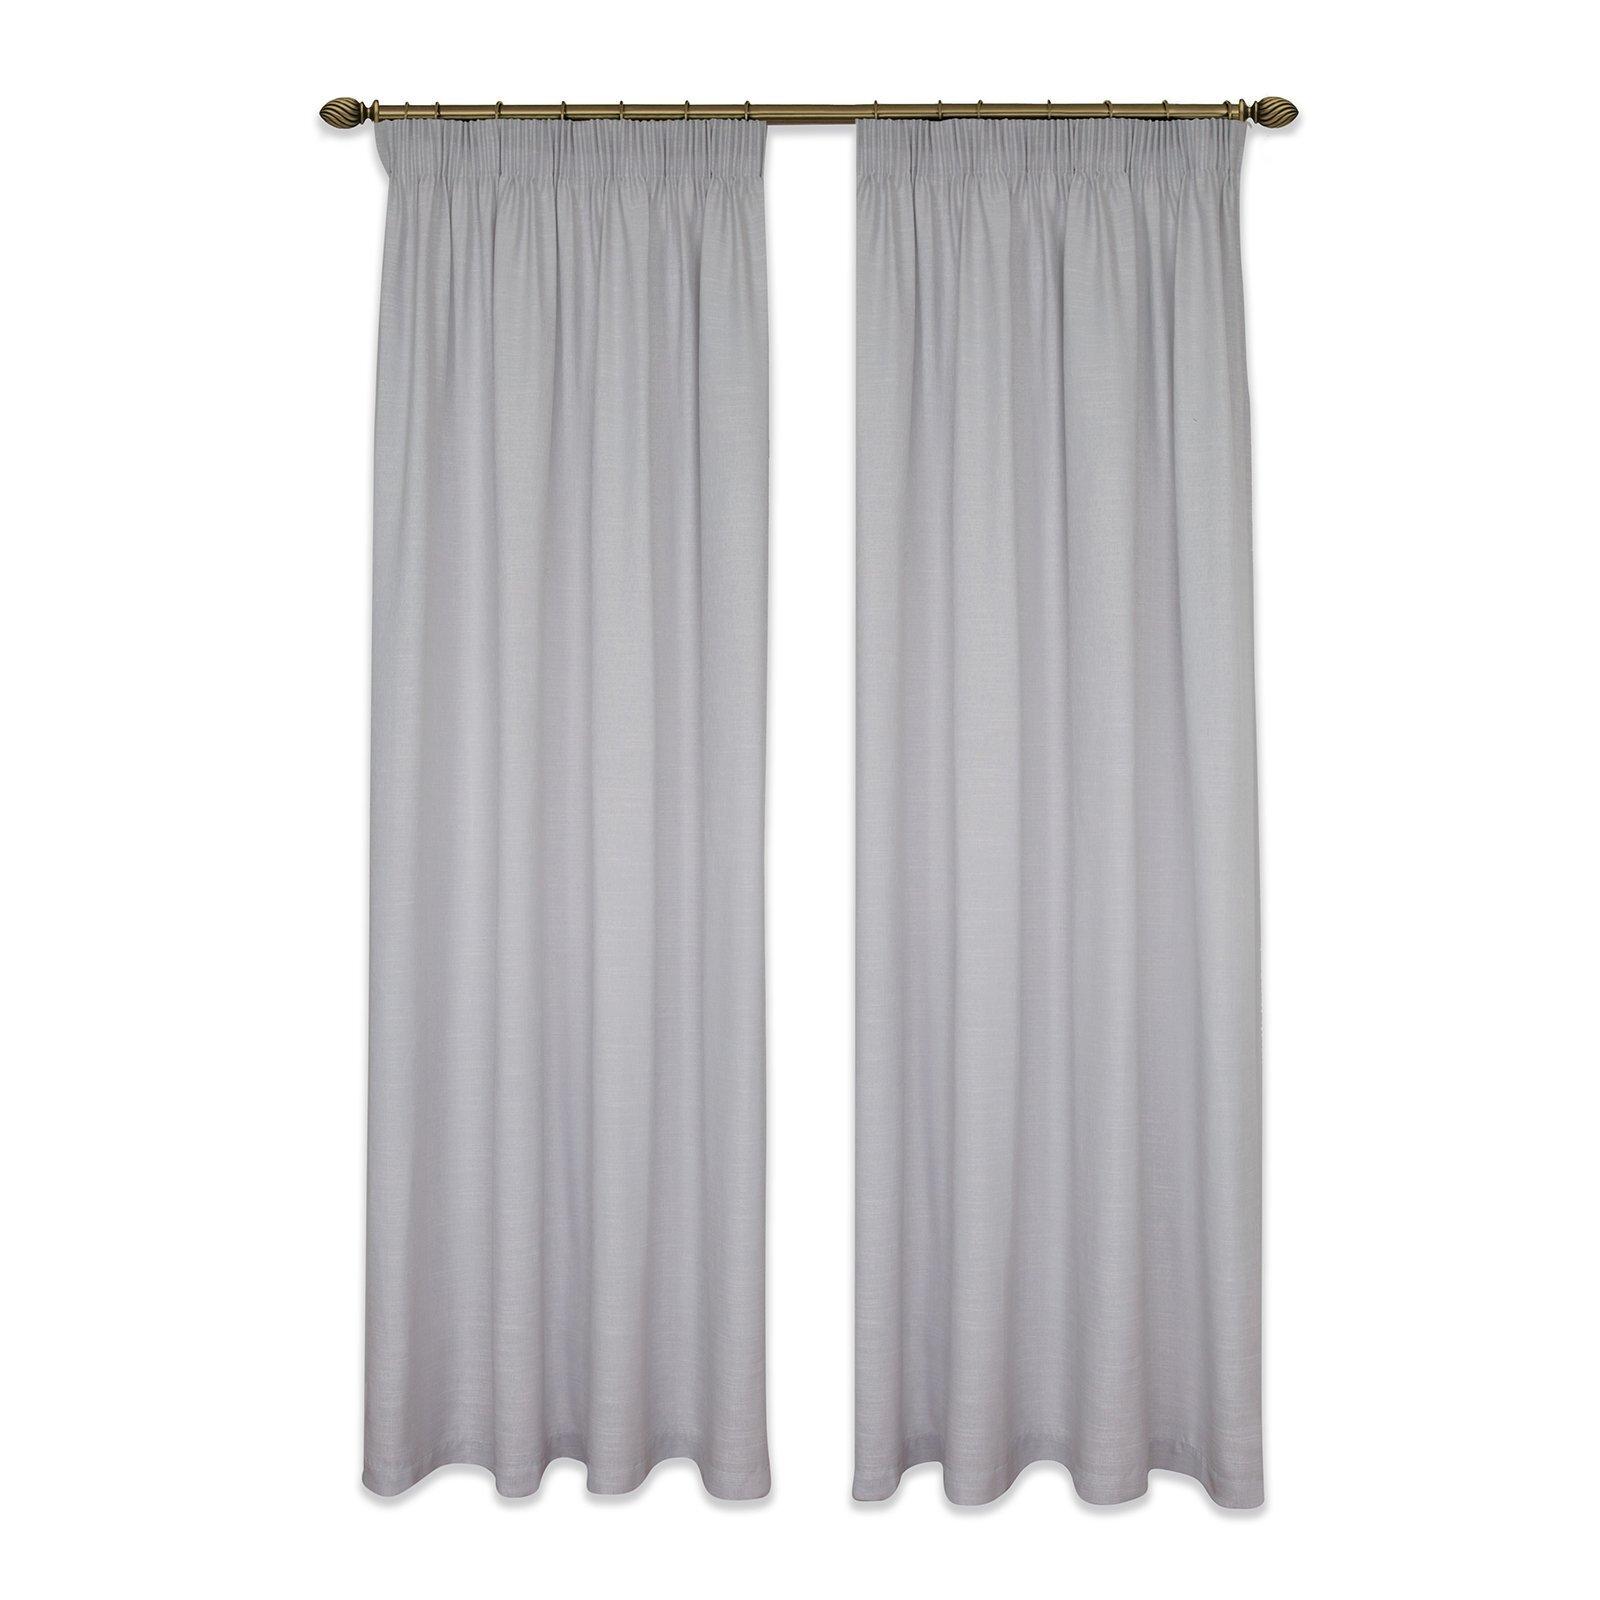 Home Profile 2.3 - 3 x 1.6m Boston Thermal Curtain